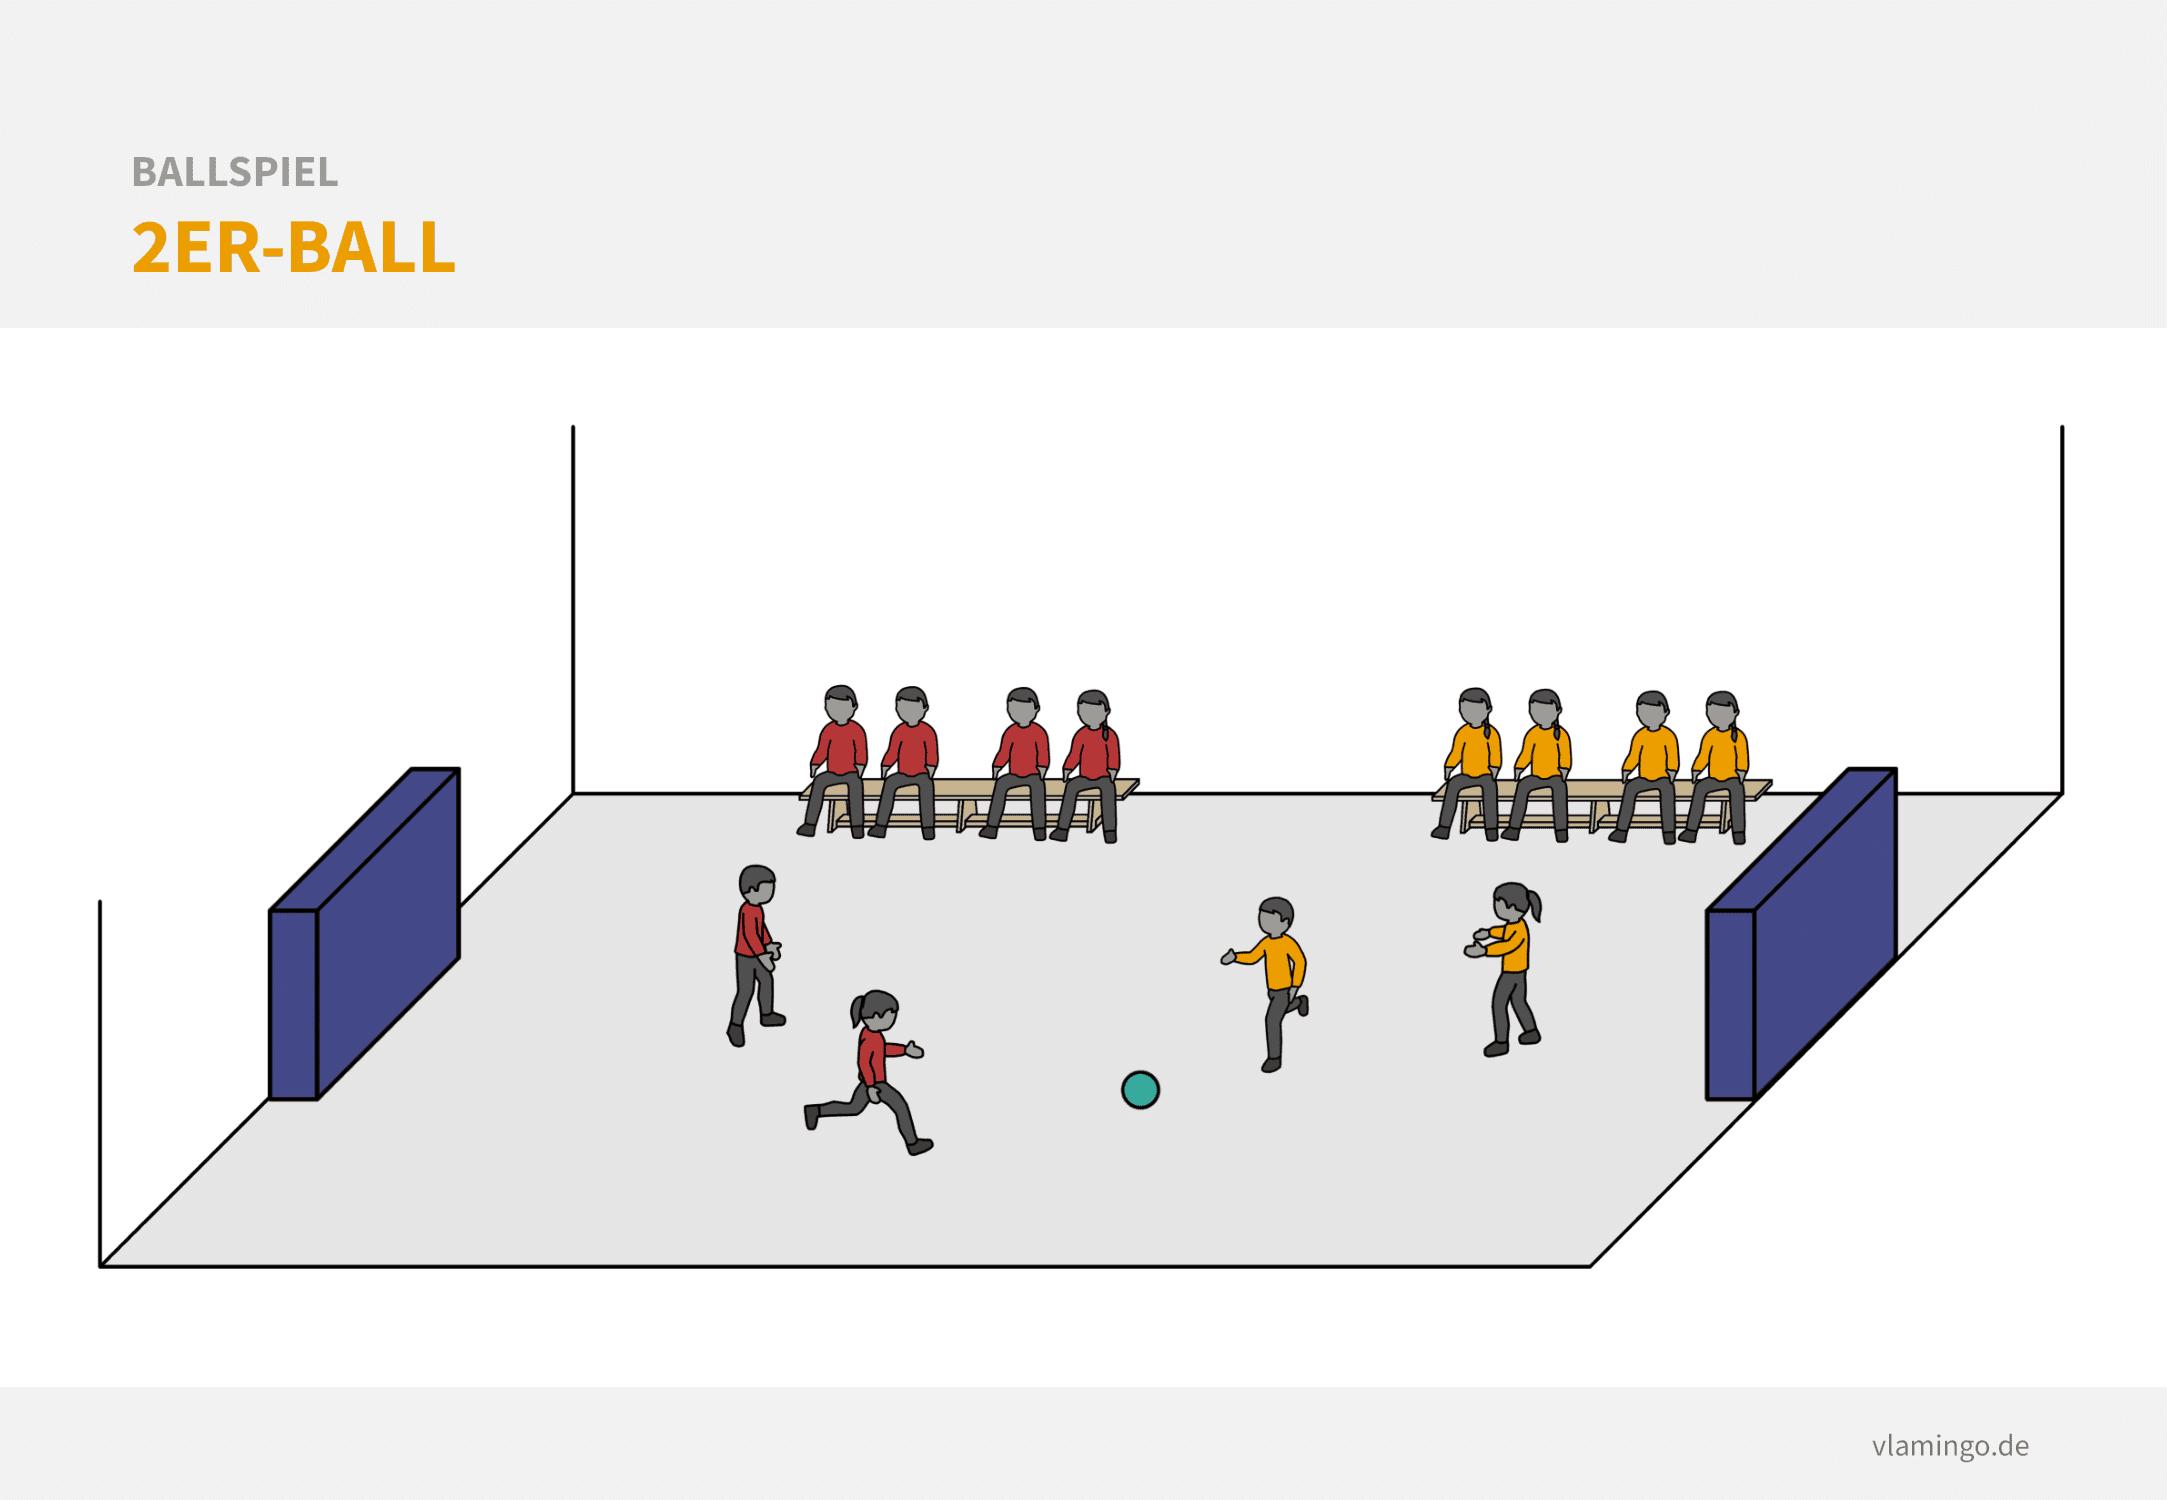 Ballspiel: 2er-Ball